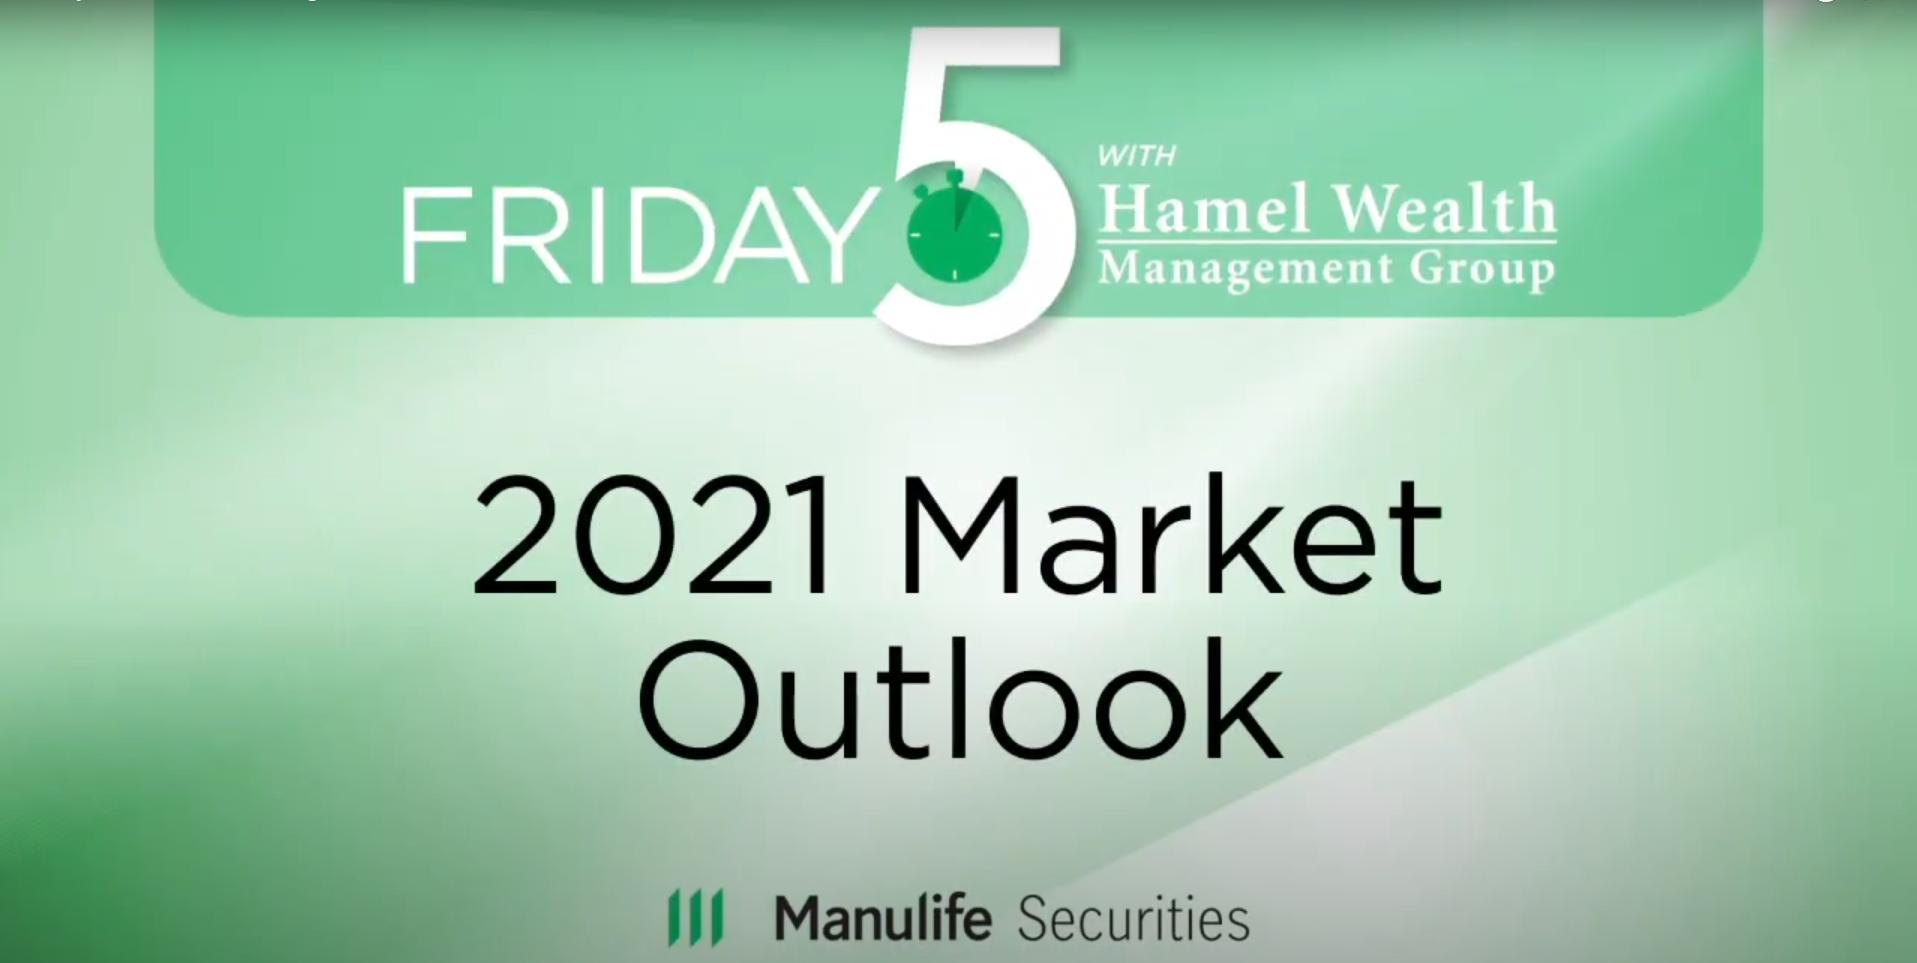 Friday 5 - Mike Greenberg - 2021 Market Outlook Thumbnail